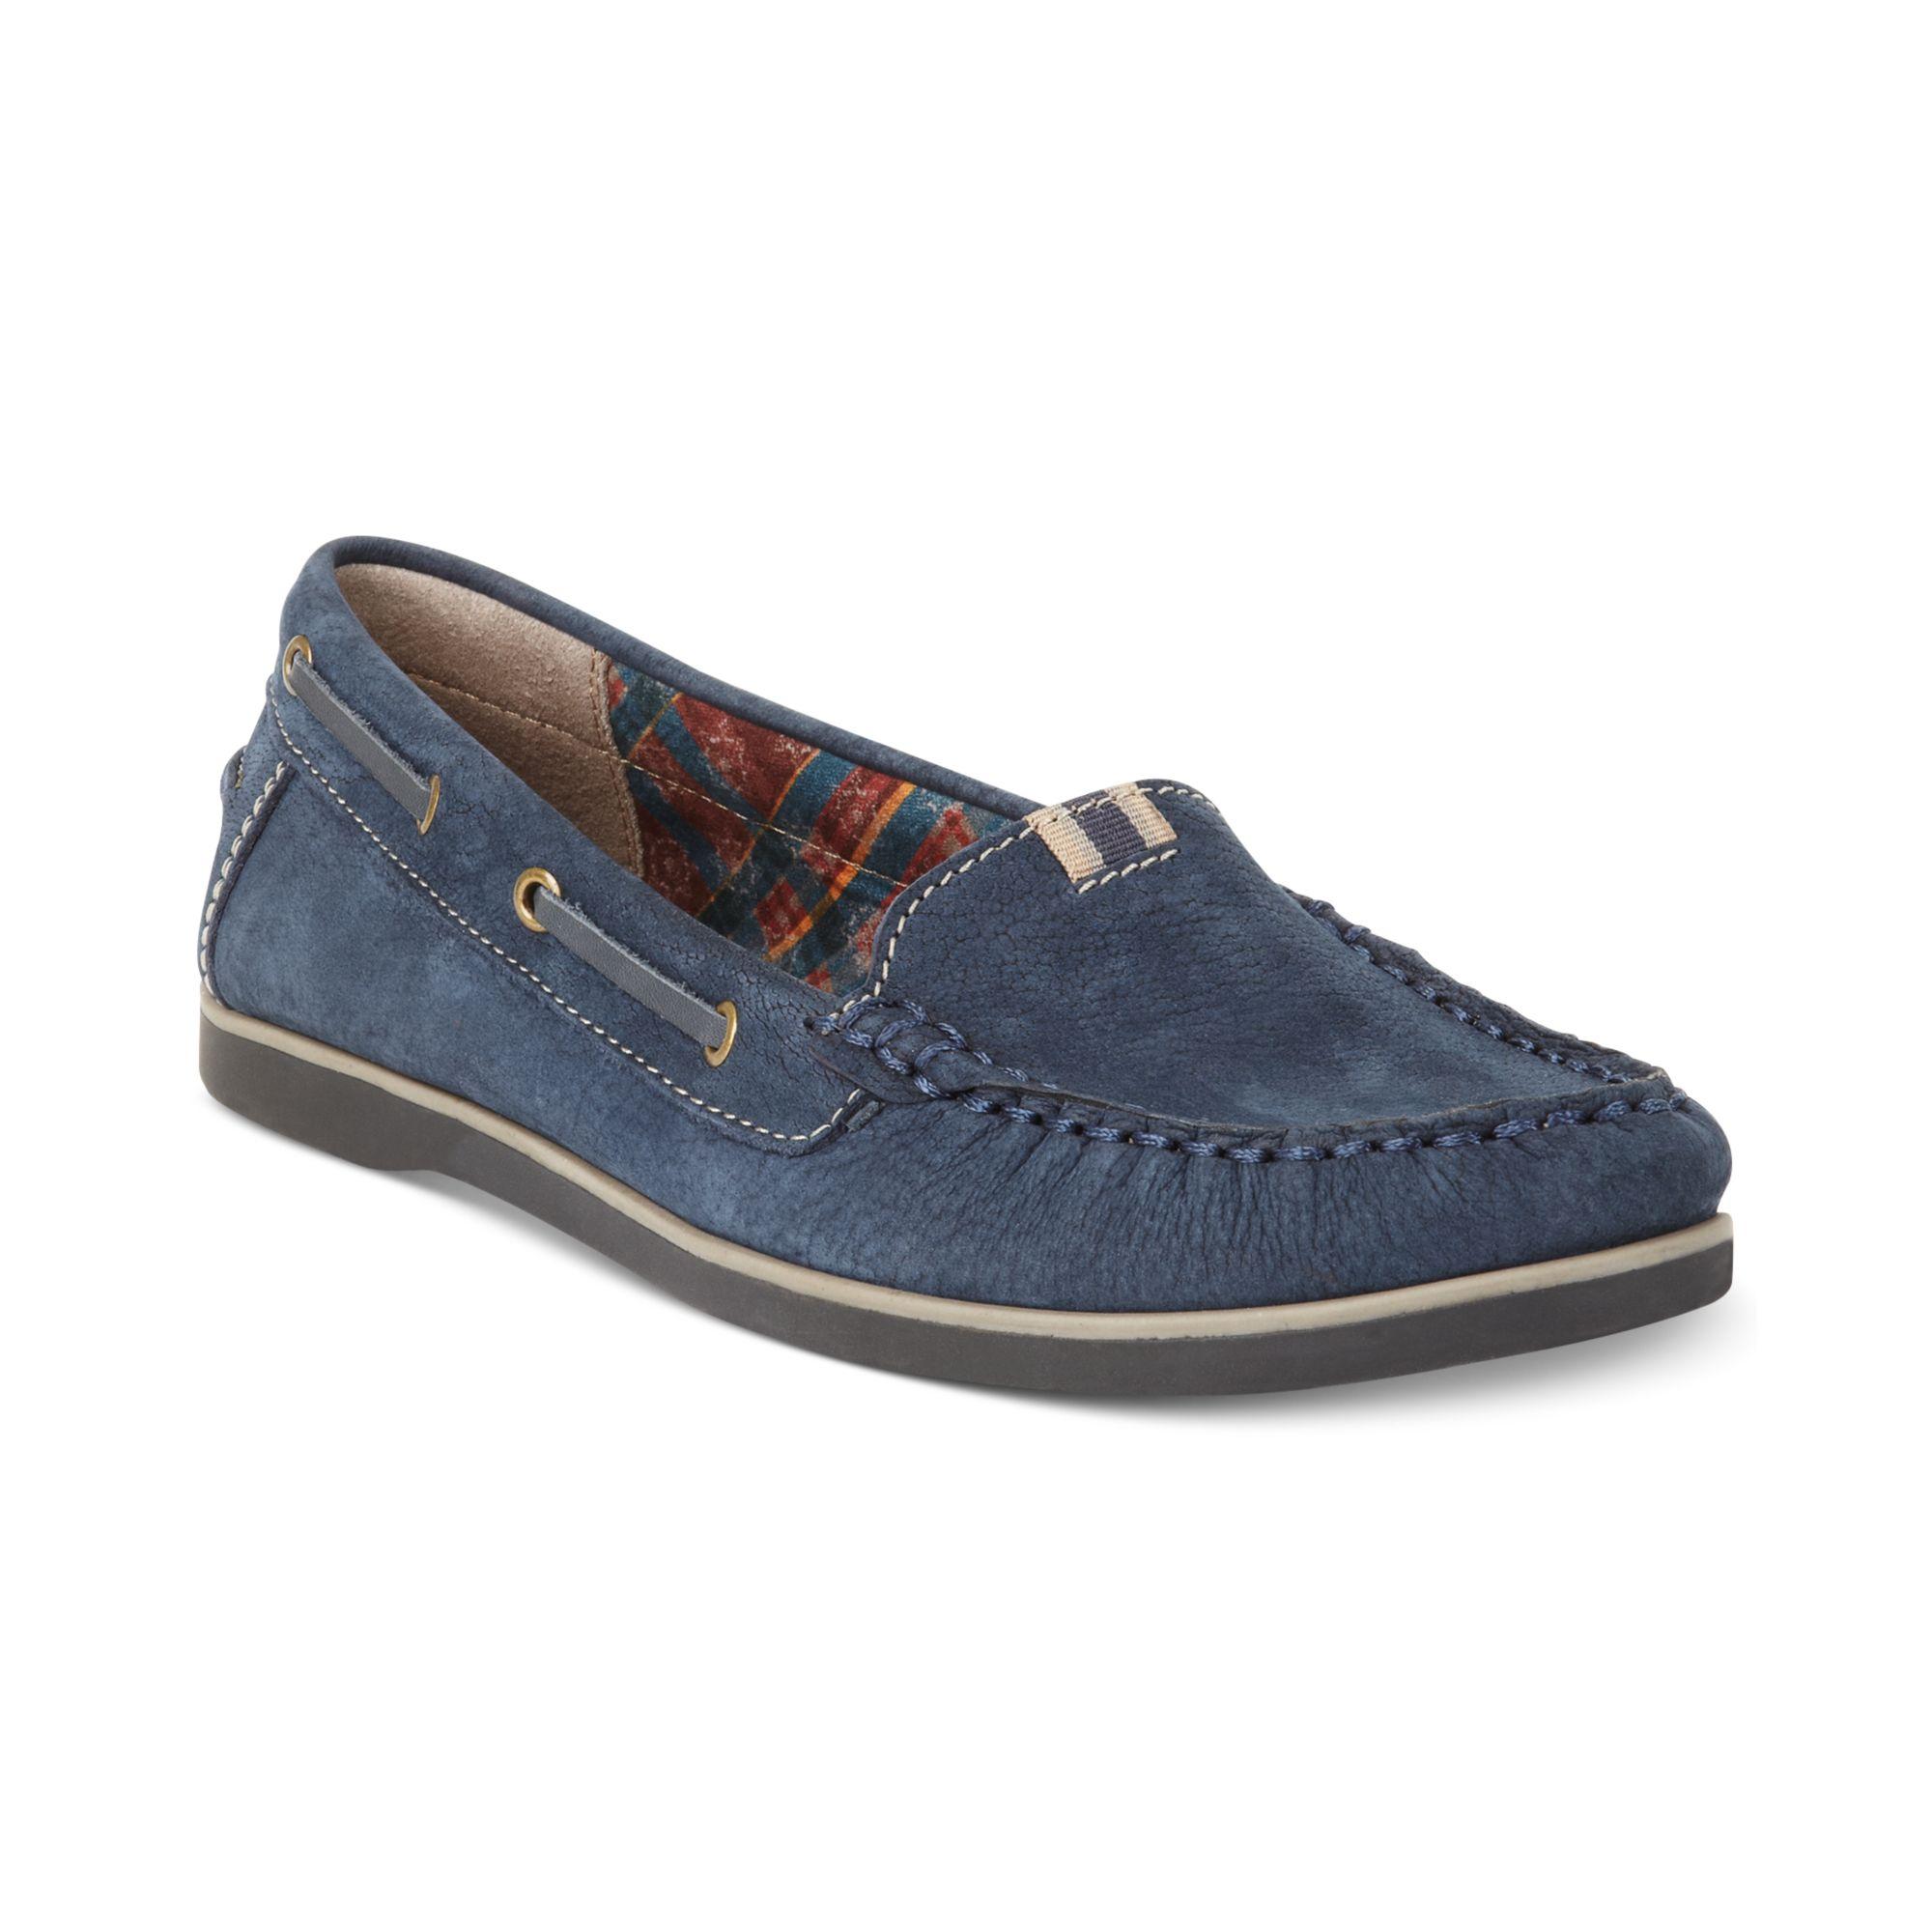 Naturalizer Hanover Boat Shoes in Blue (Navy Nubuck